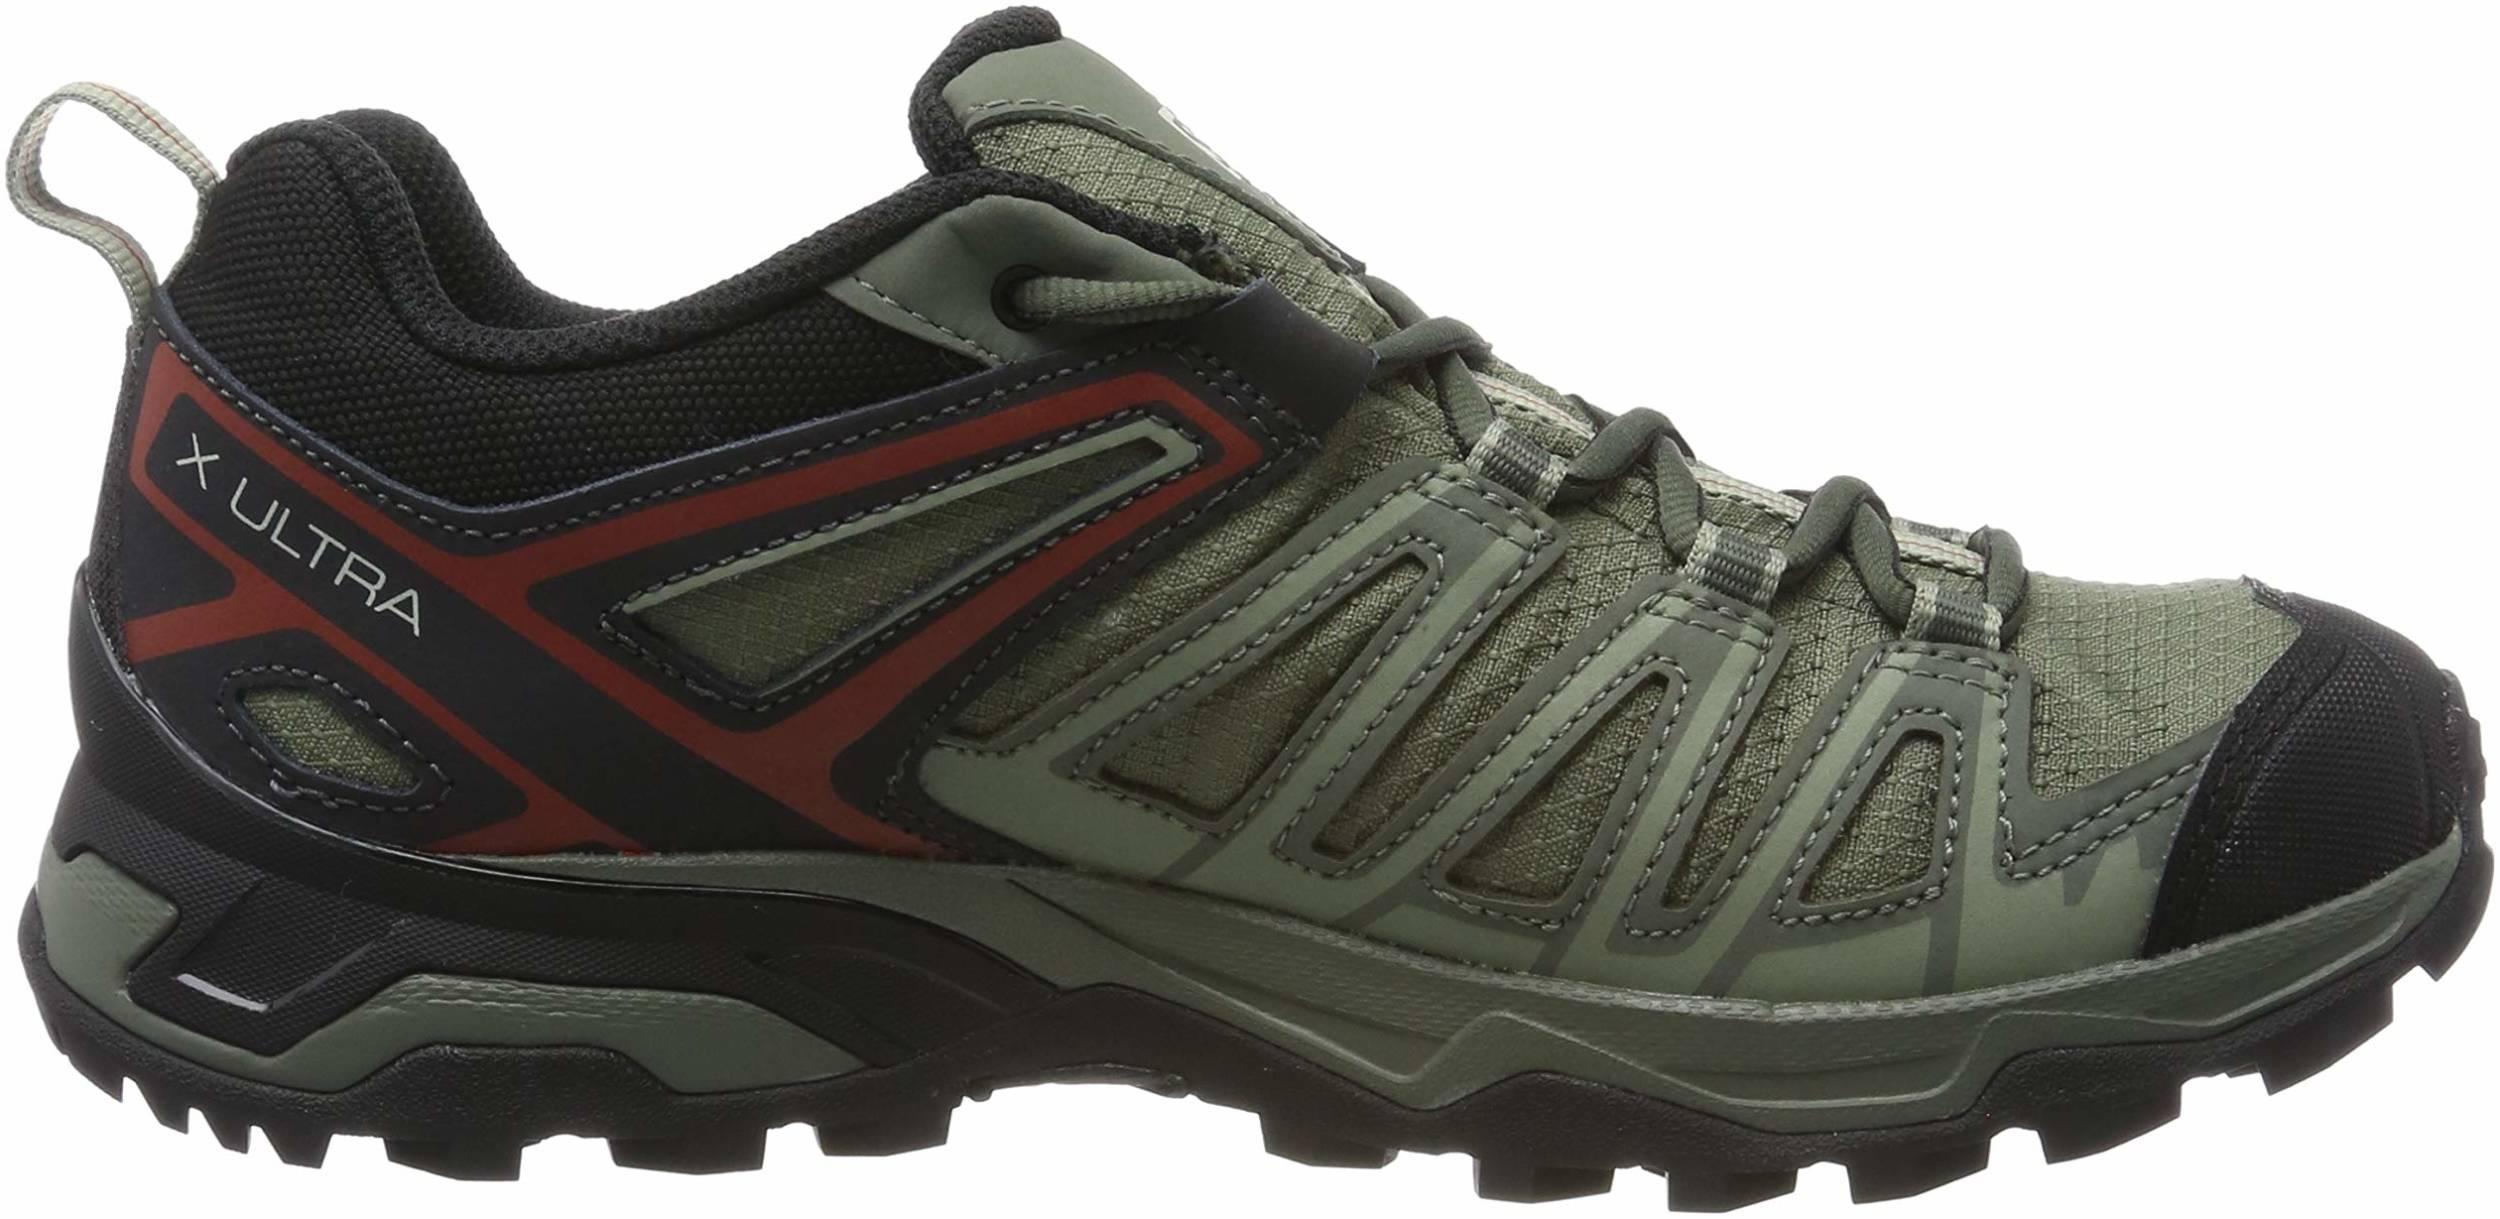 Save 20% on Salomon Hiking Shoes (35